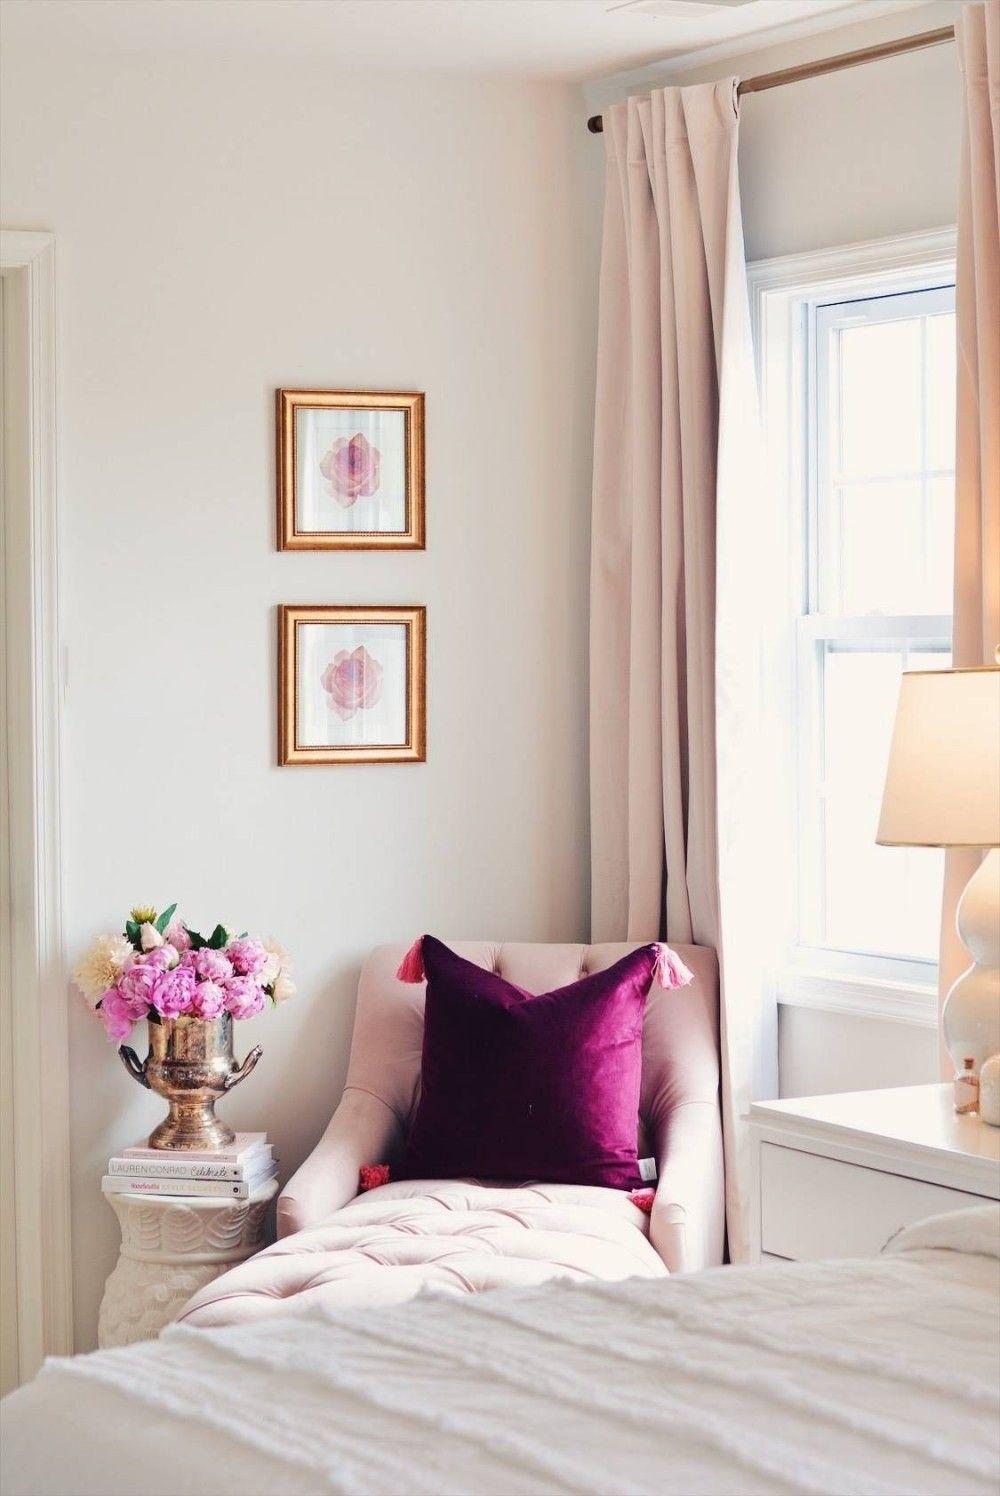 Drew barrymore walmart flower home collection pink